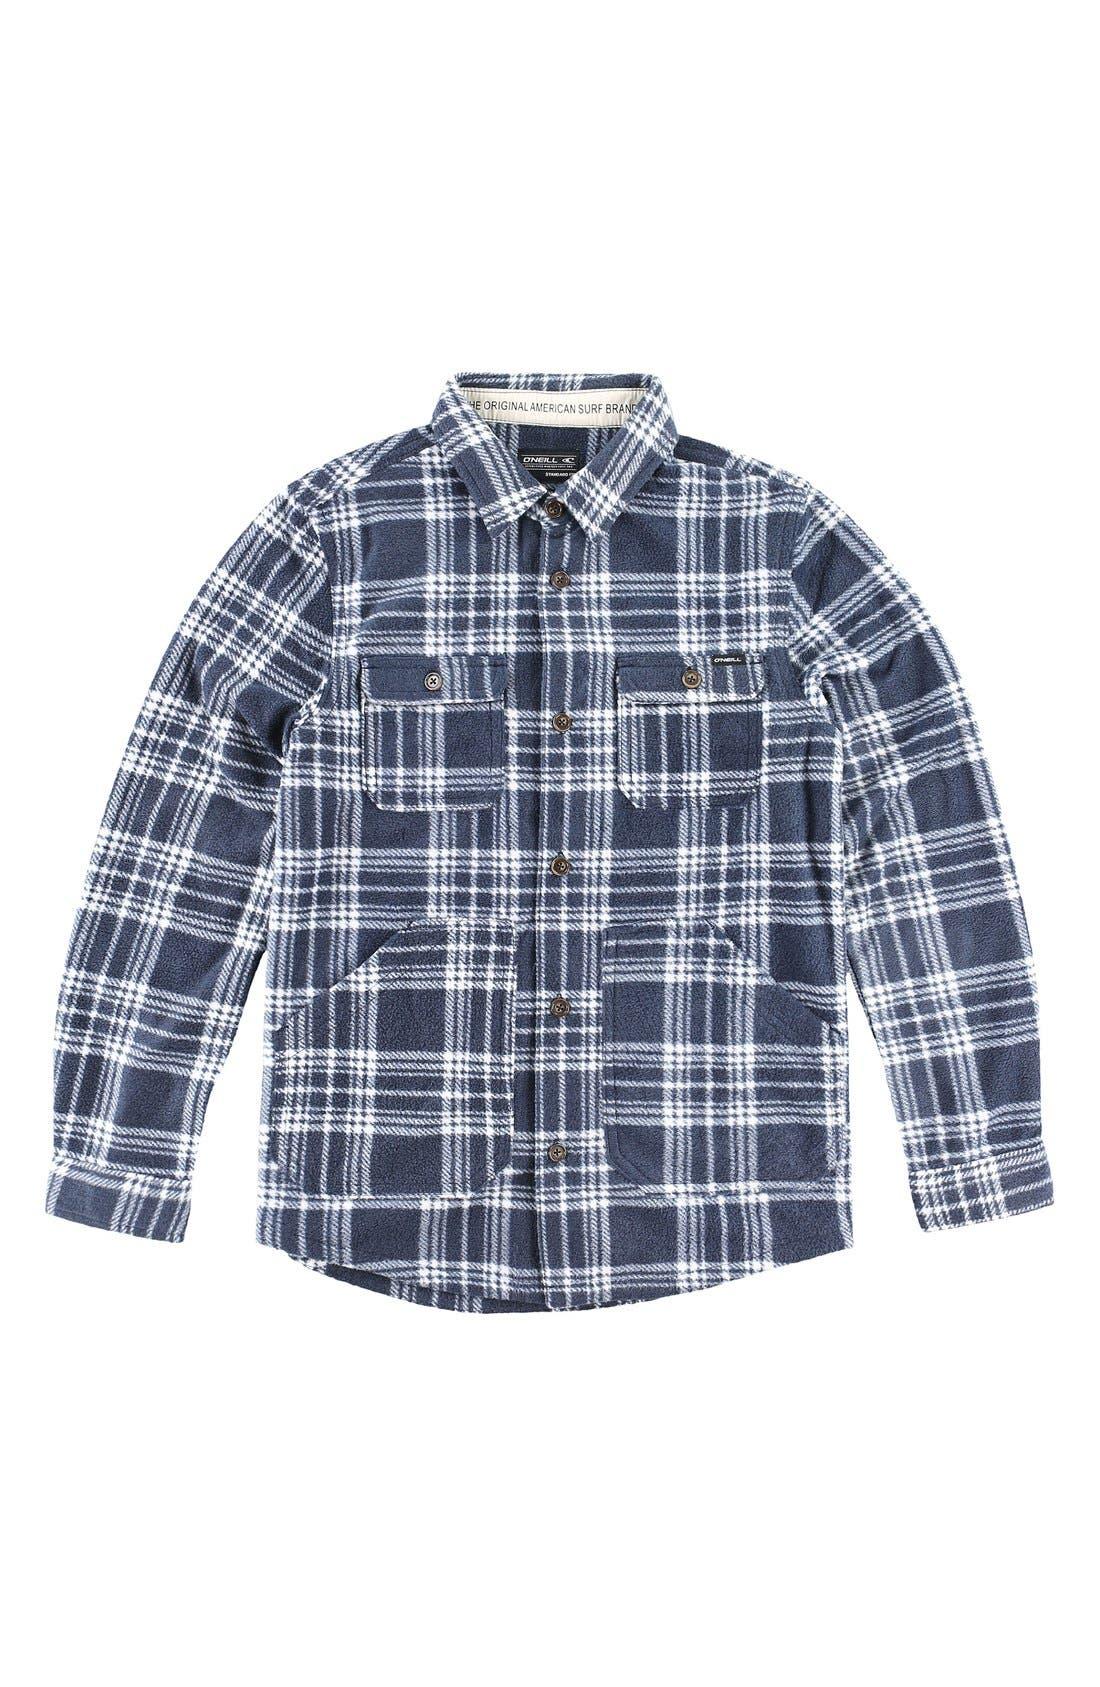 Main Image - O'Neill 'Glacier' Check Long Sleeve Fleece Shirt (Big Boys)